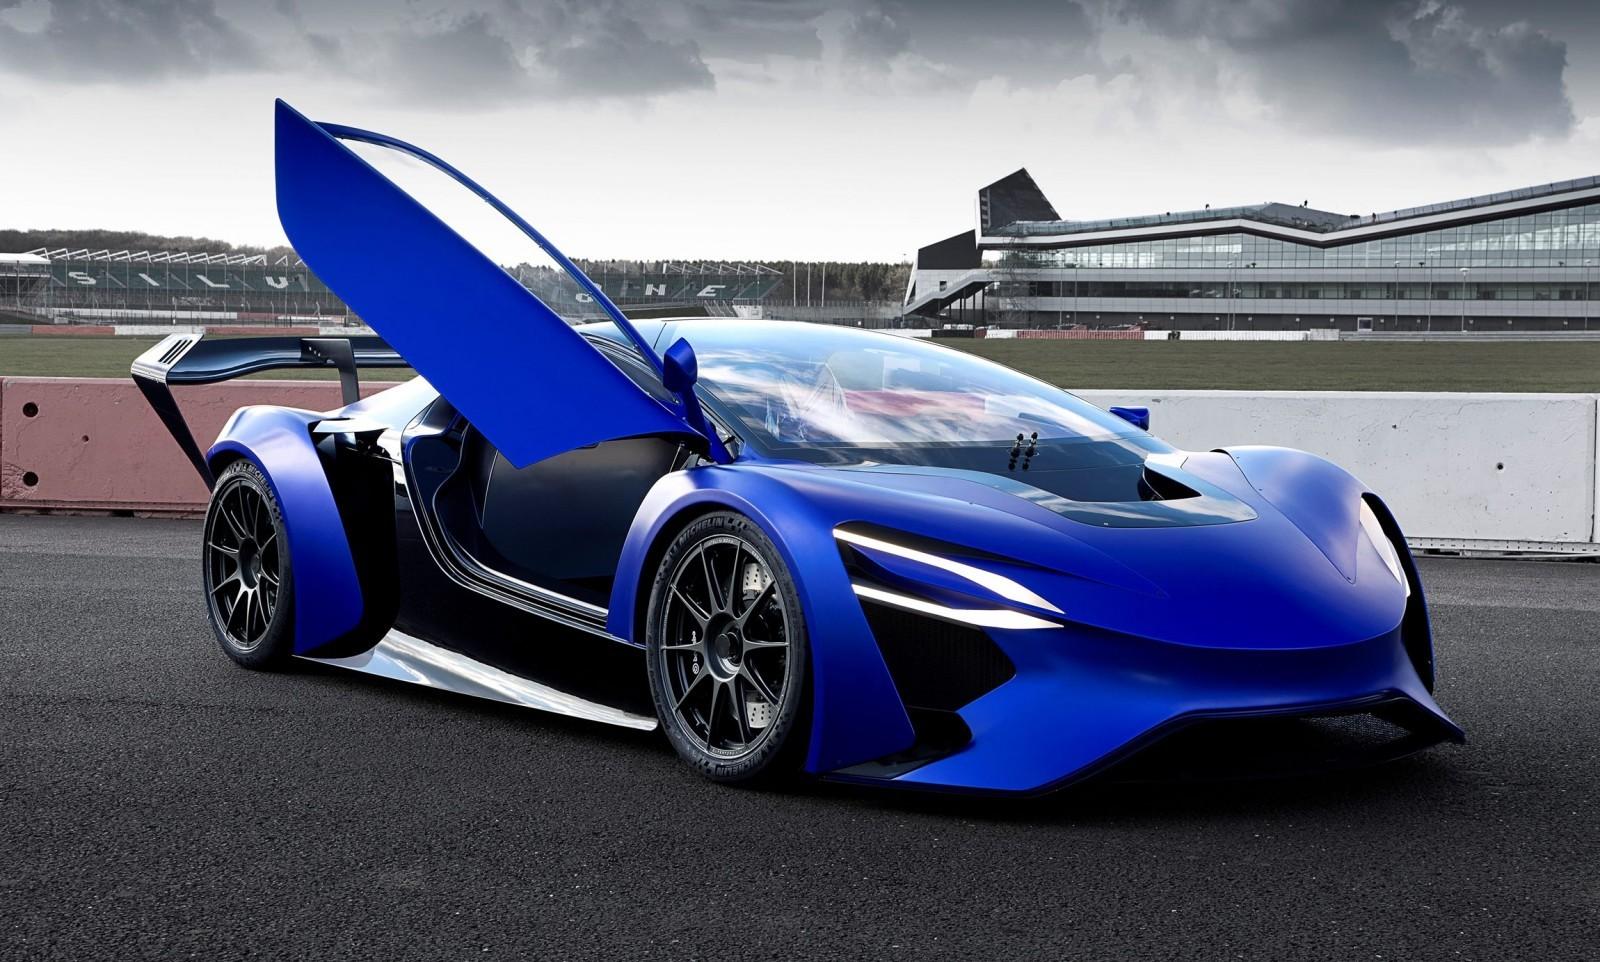 Techrules Trev Supercar Concept